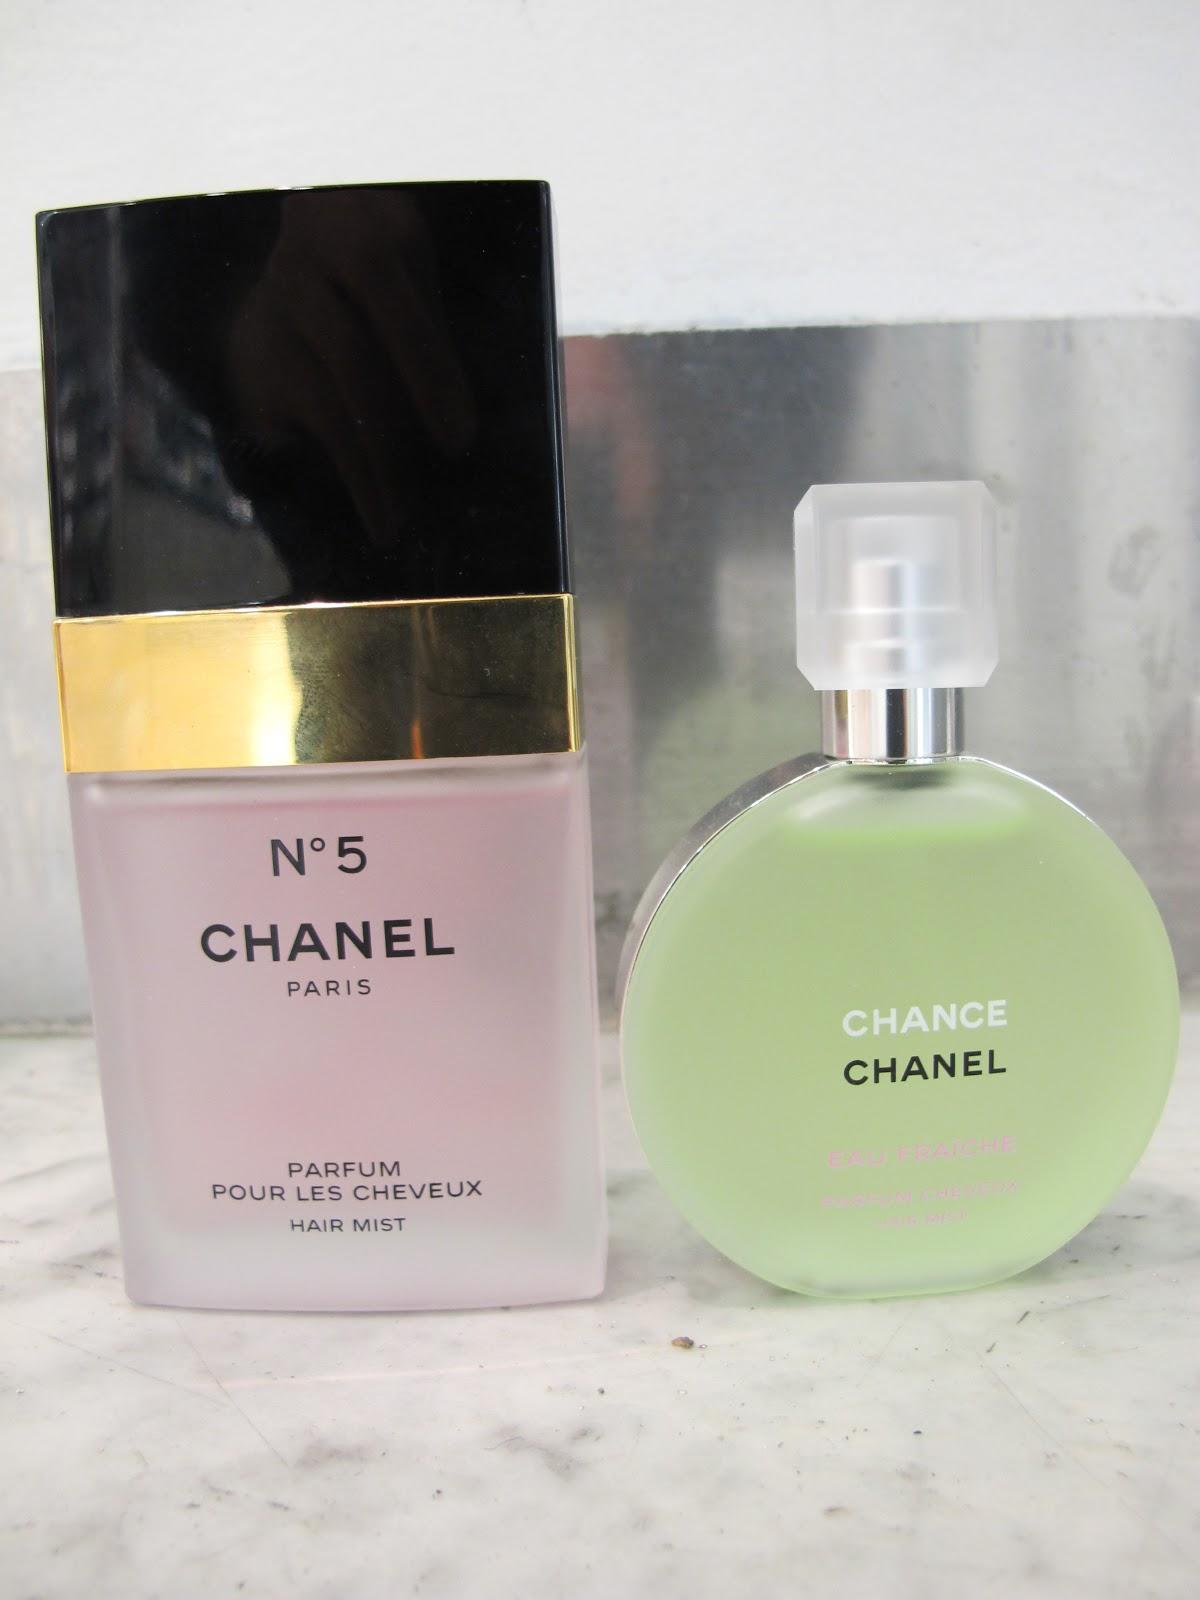 0aaf3238f0d43 Viimeisin hiustuoksutulokas on kuitenkin oma suosikkini Eau Tendre. Chance  Eau Tendre Eau De Toilette Spray ...